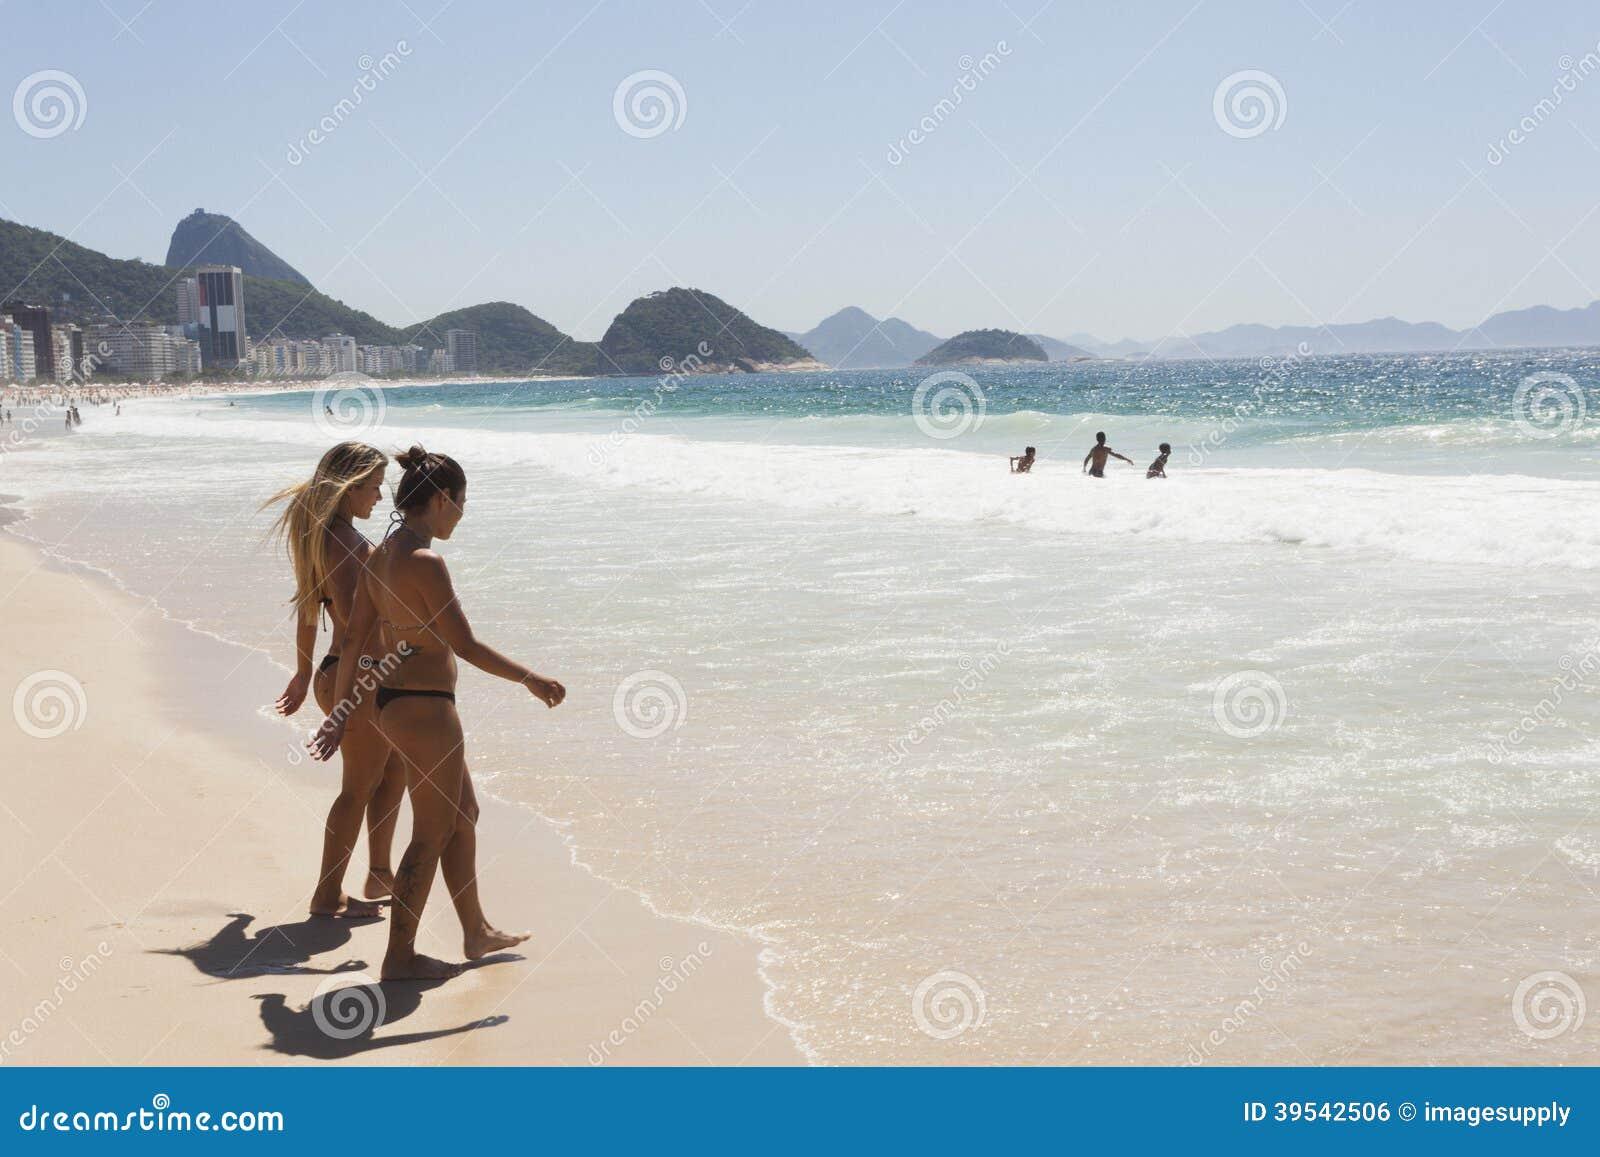 Can Bikini brazil contest de janeiro rio consider